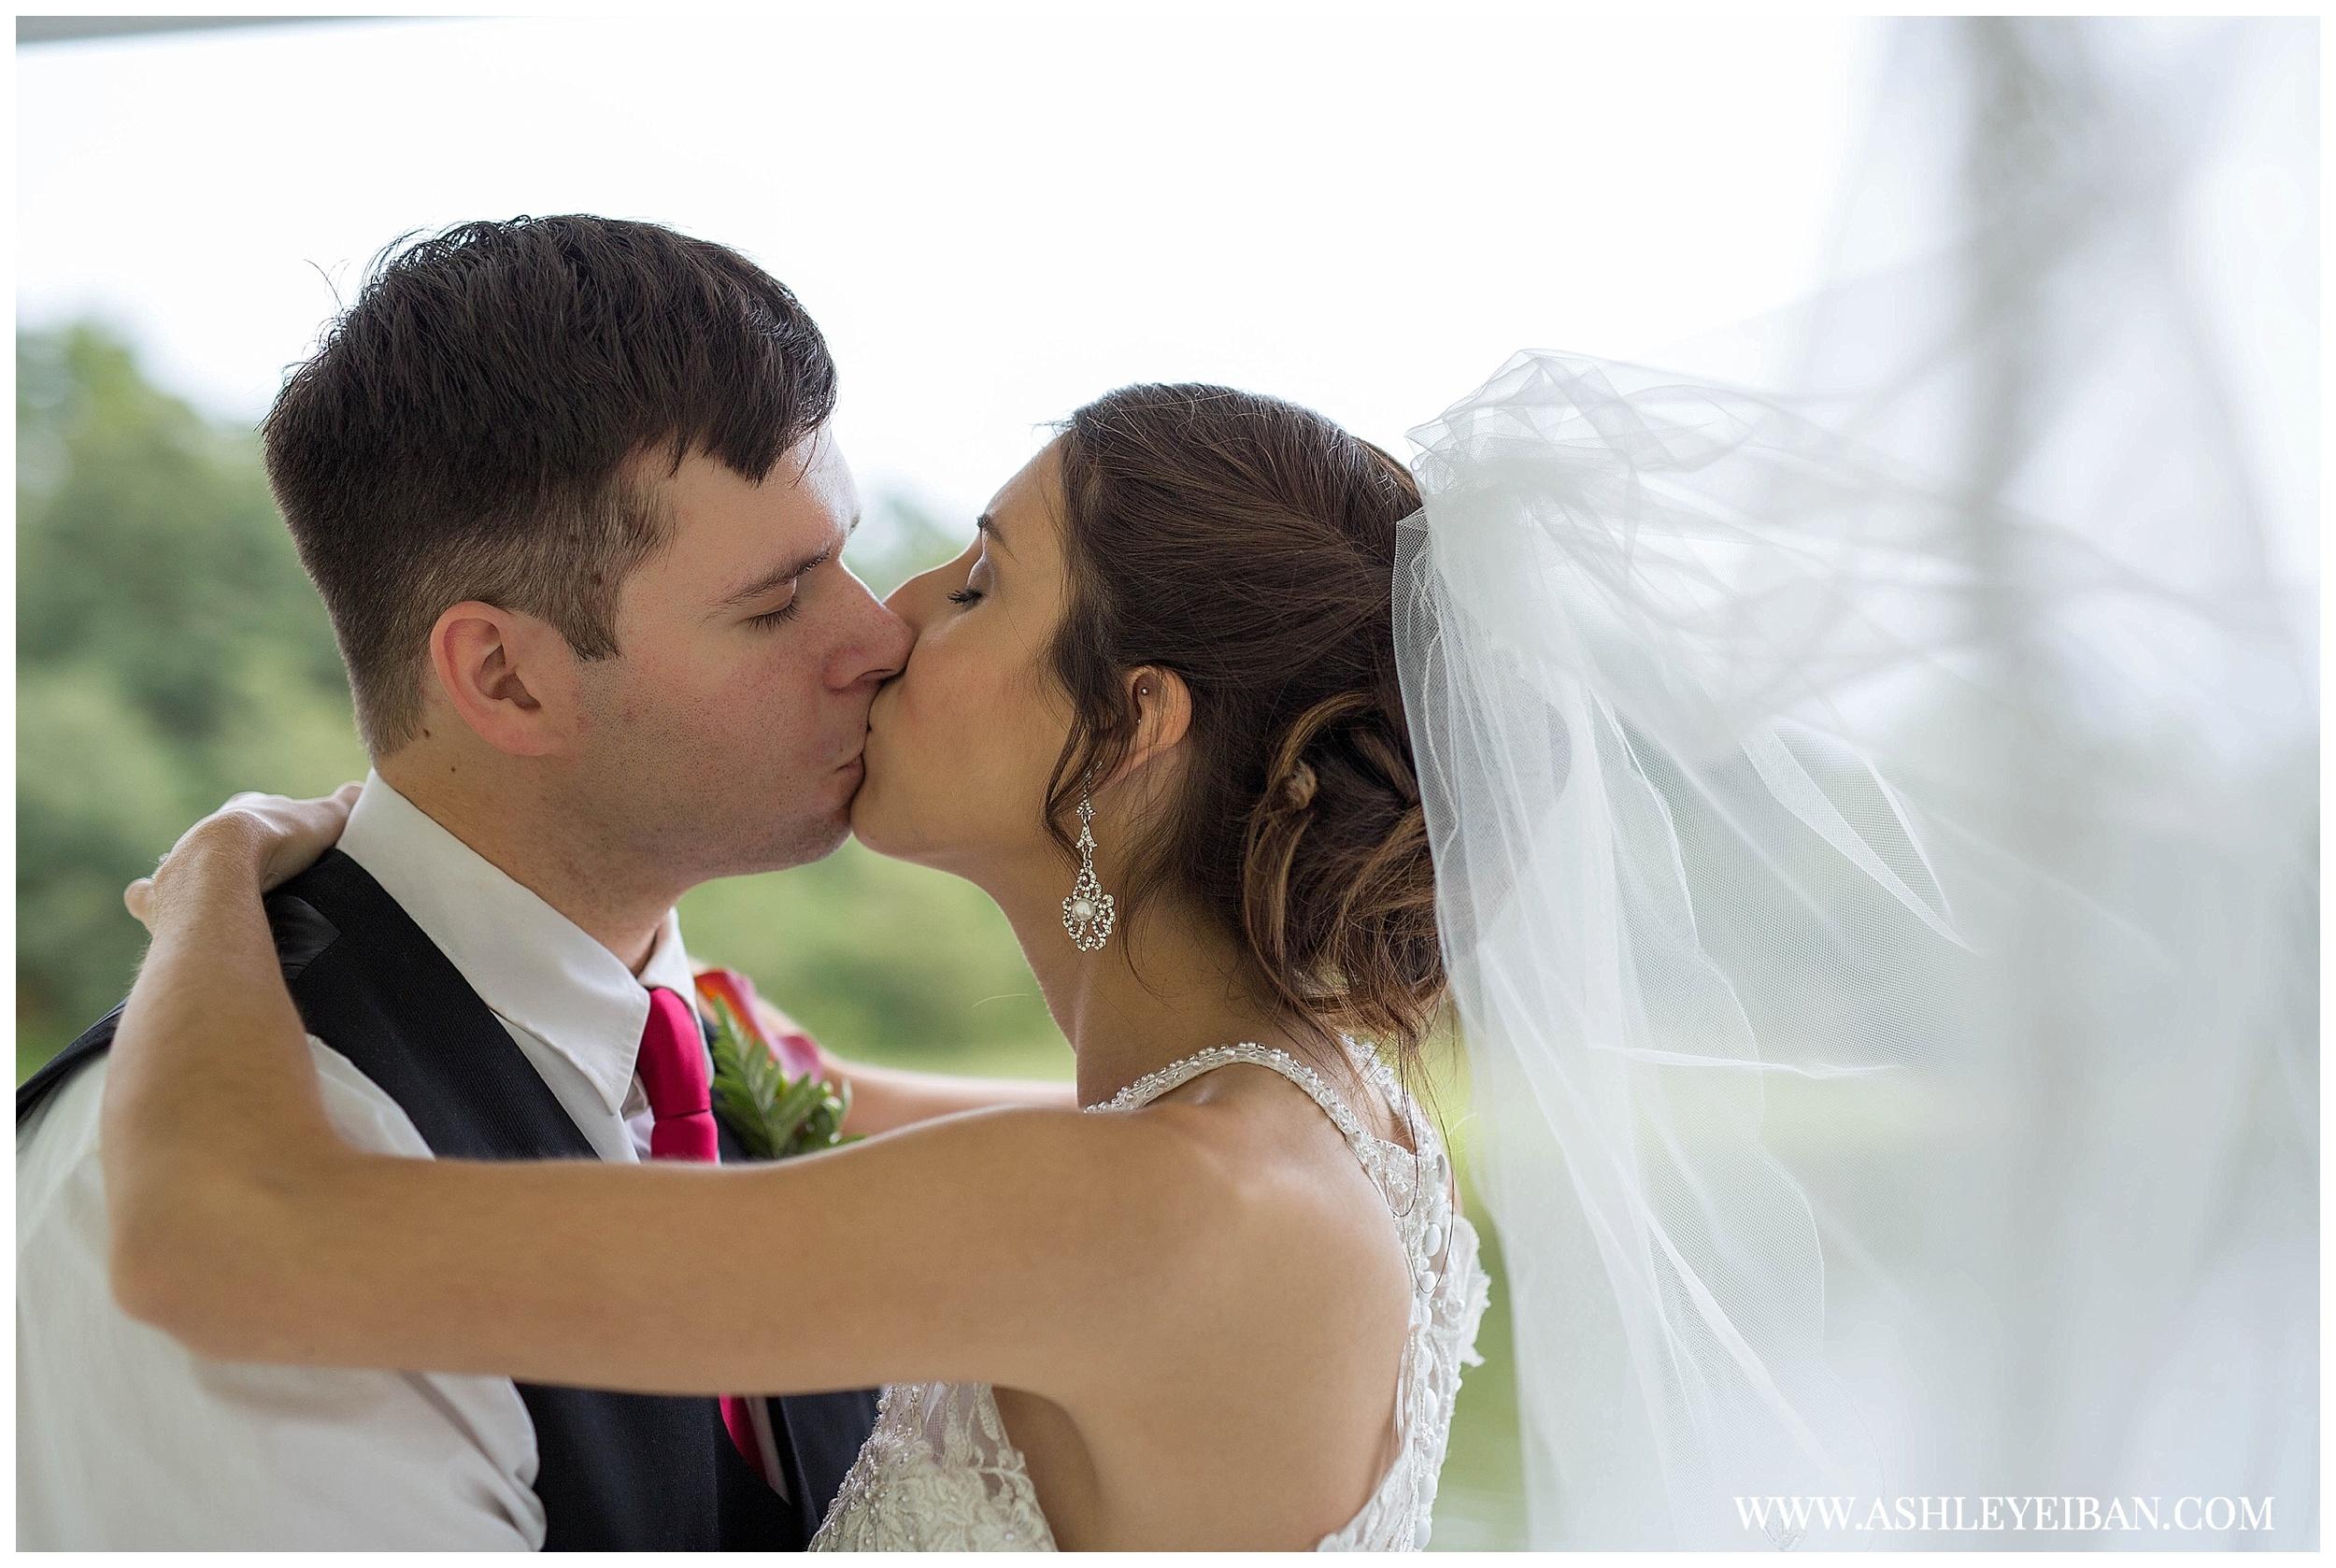 Lynchburg, Virginia Wedding Photographer || The Trivium Wedding || Forest, Virginia Wedding Photographer || Fall Wedding || Ashley Eiban Photography || www.ashleyeiban.com